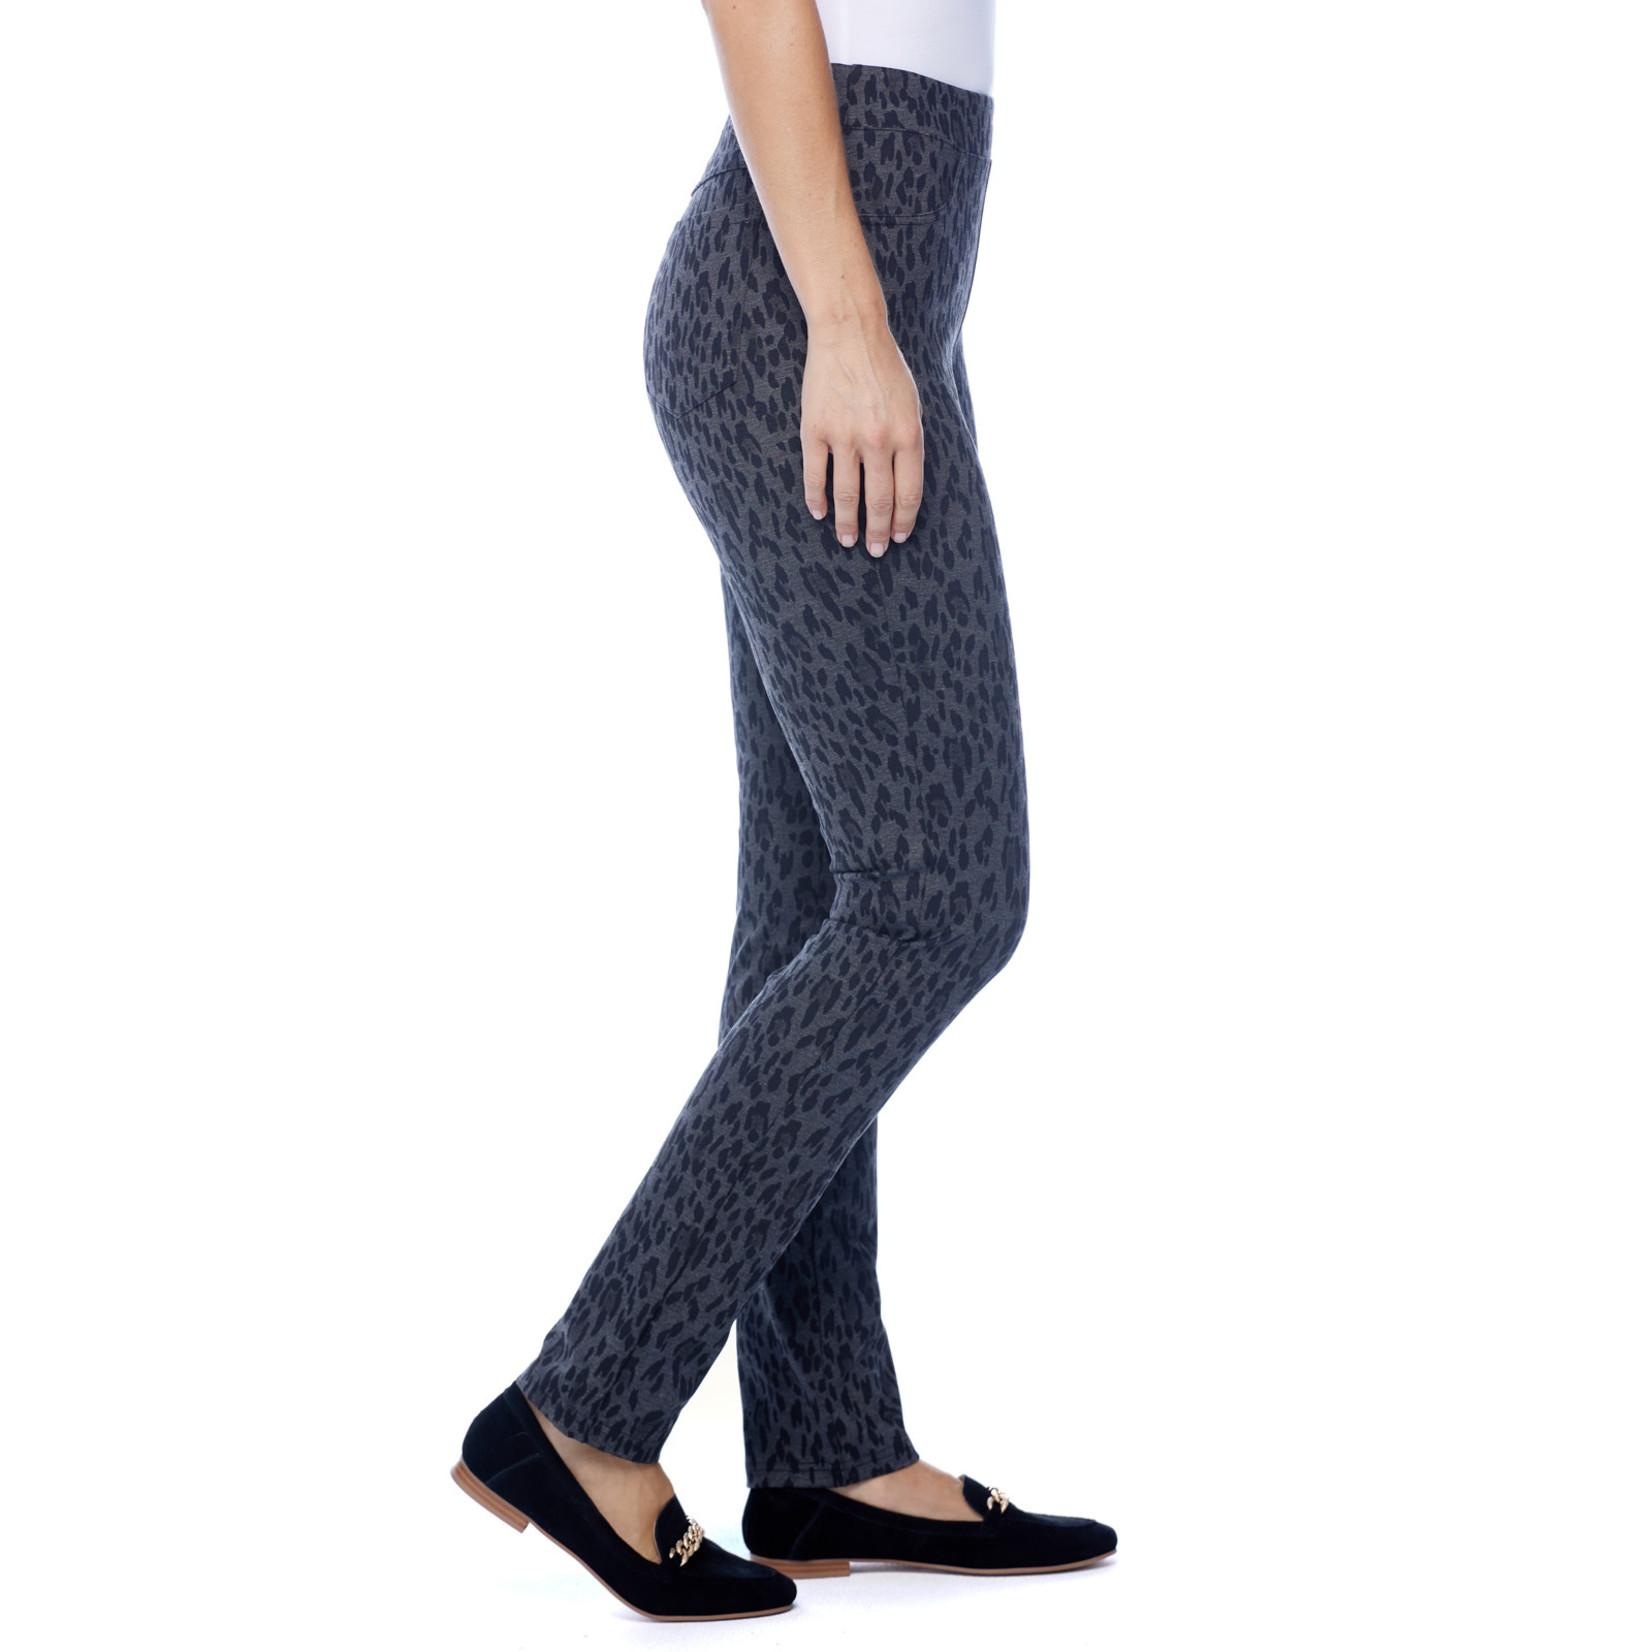 FDJ Pull-On Slim Leg in Blk/Gray Animal Print